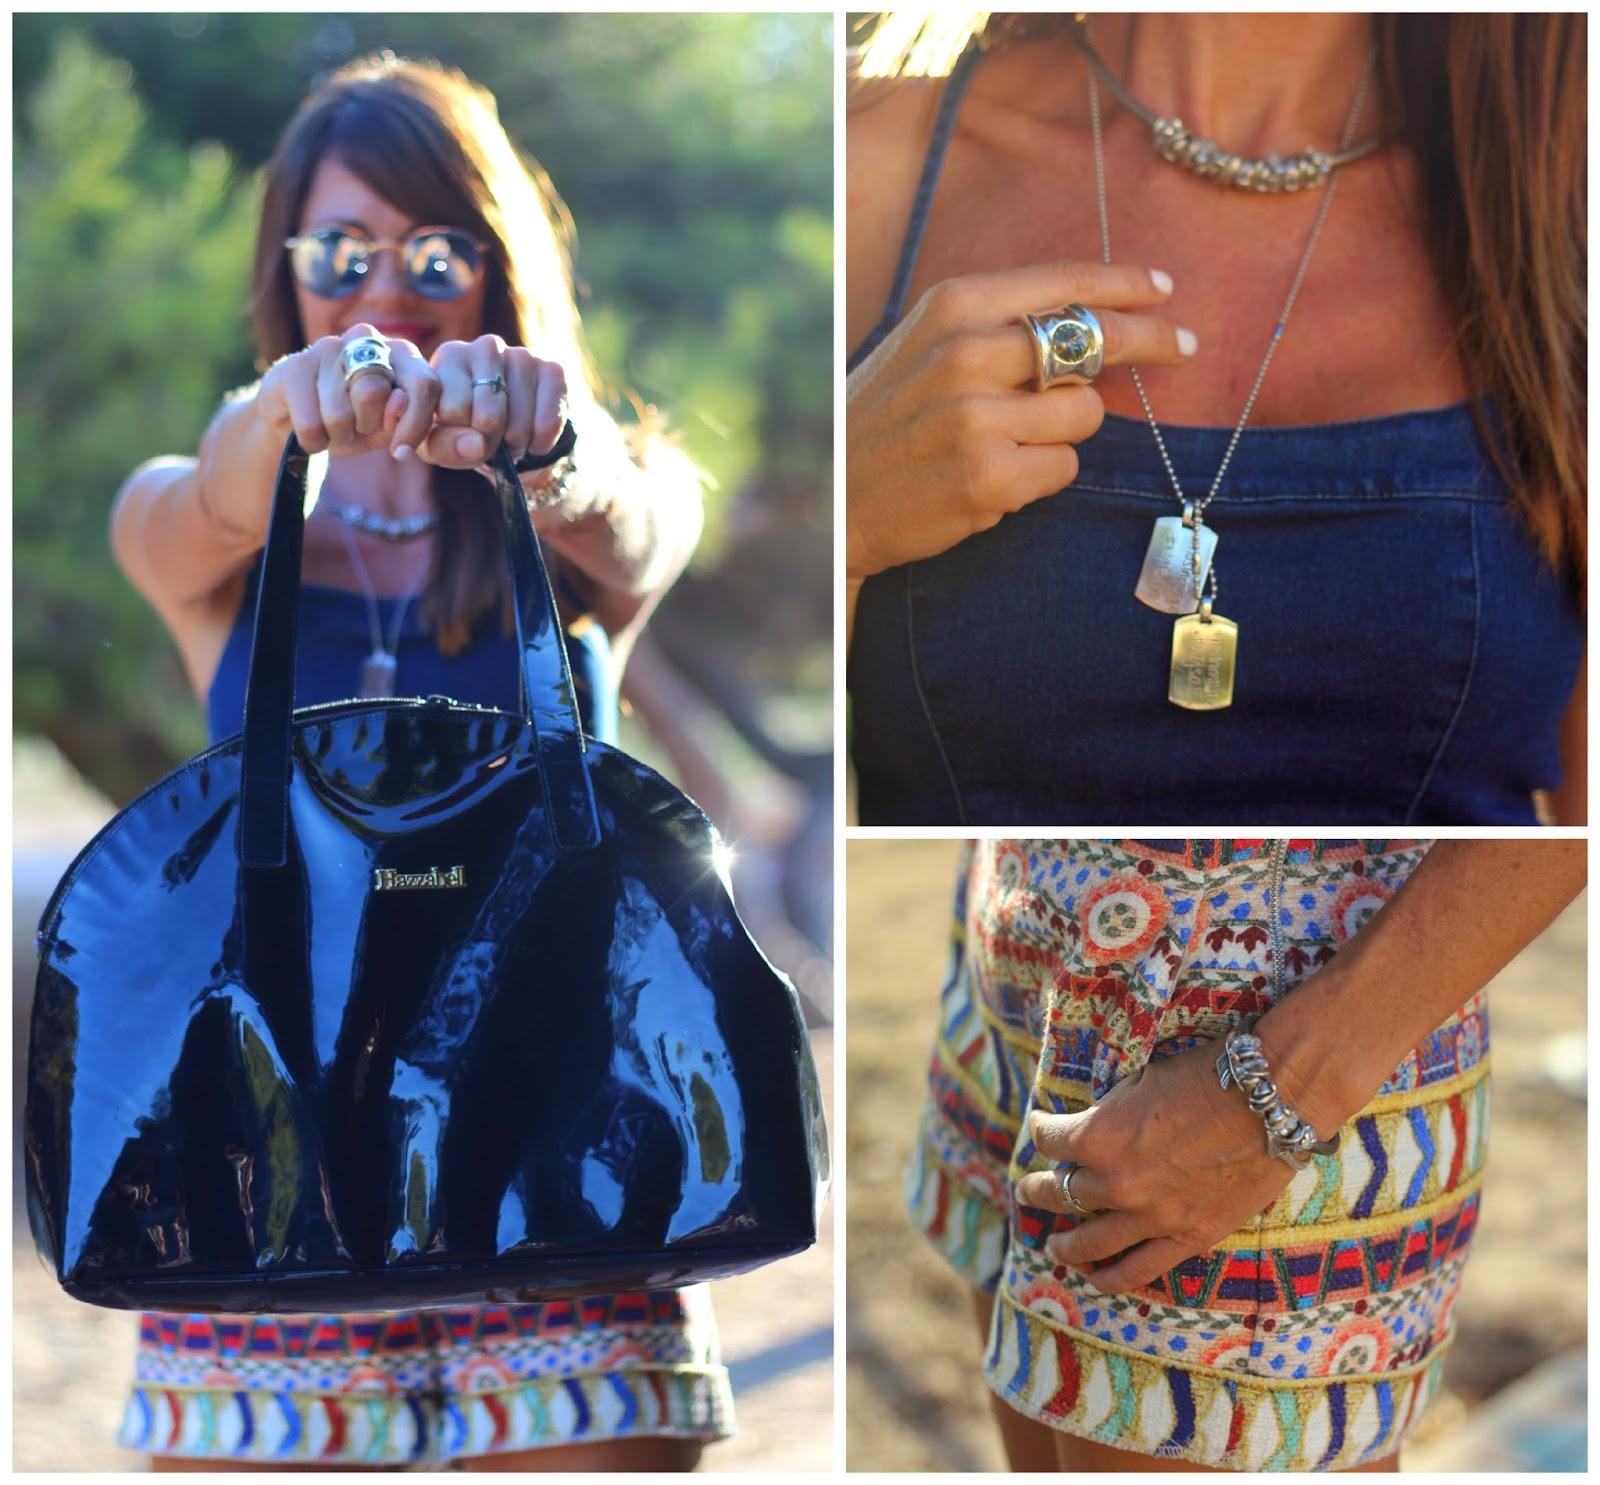 Streetstyle 2014 - Shorts Zara - Crop top denim